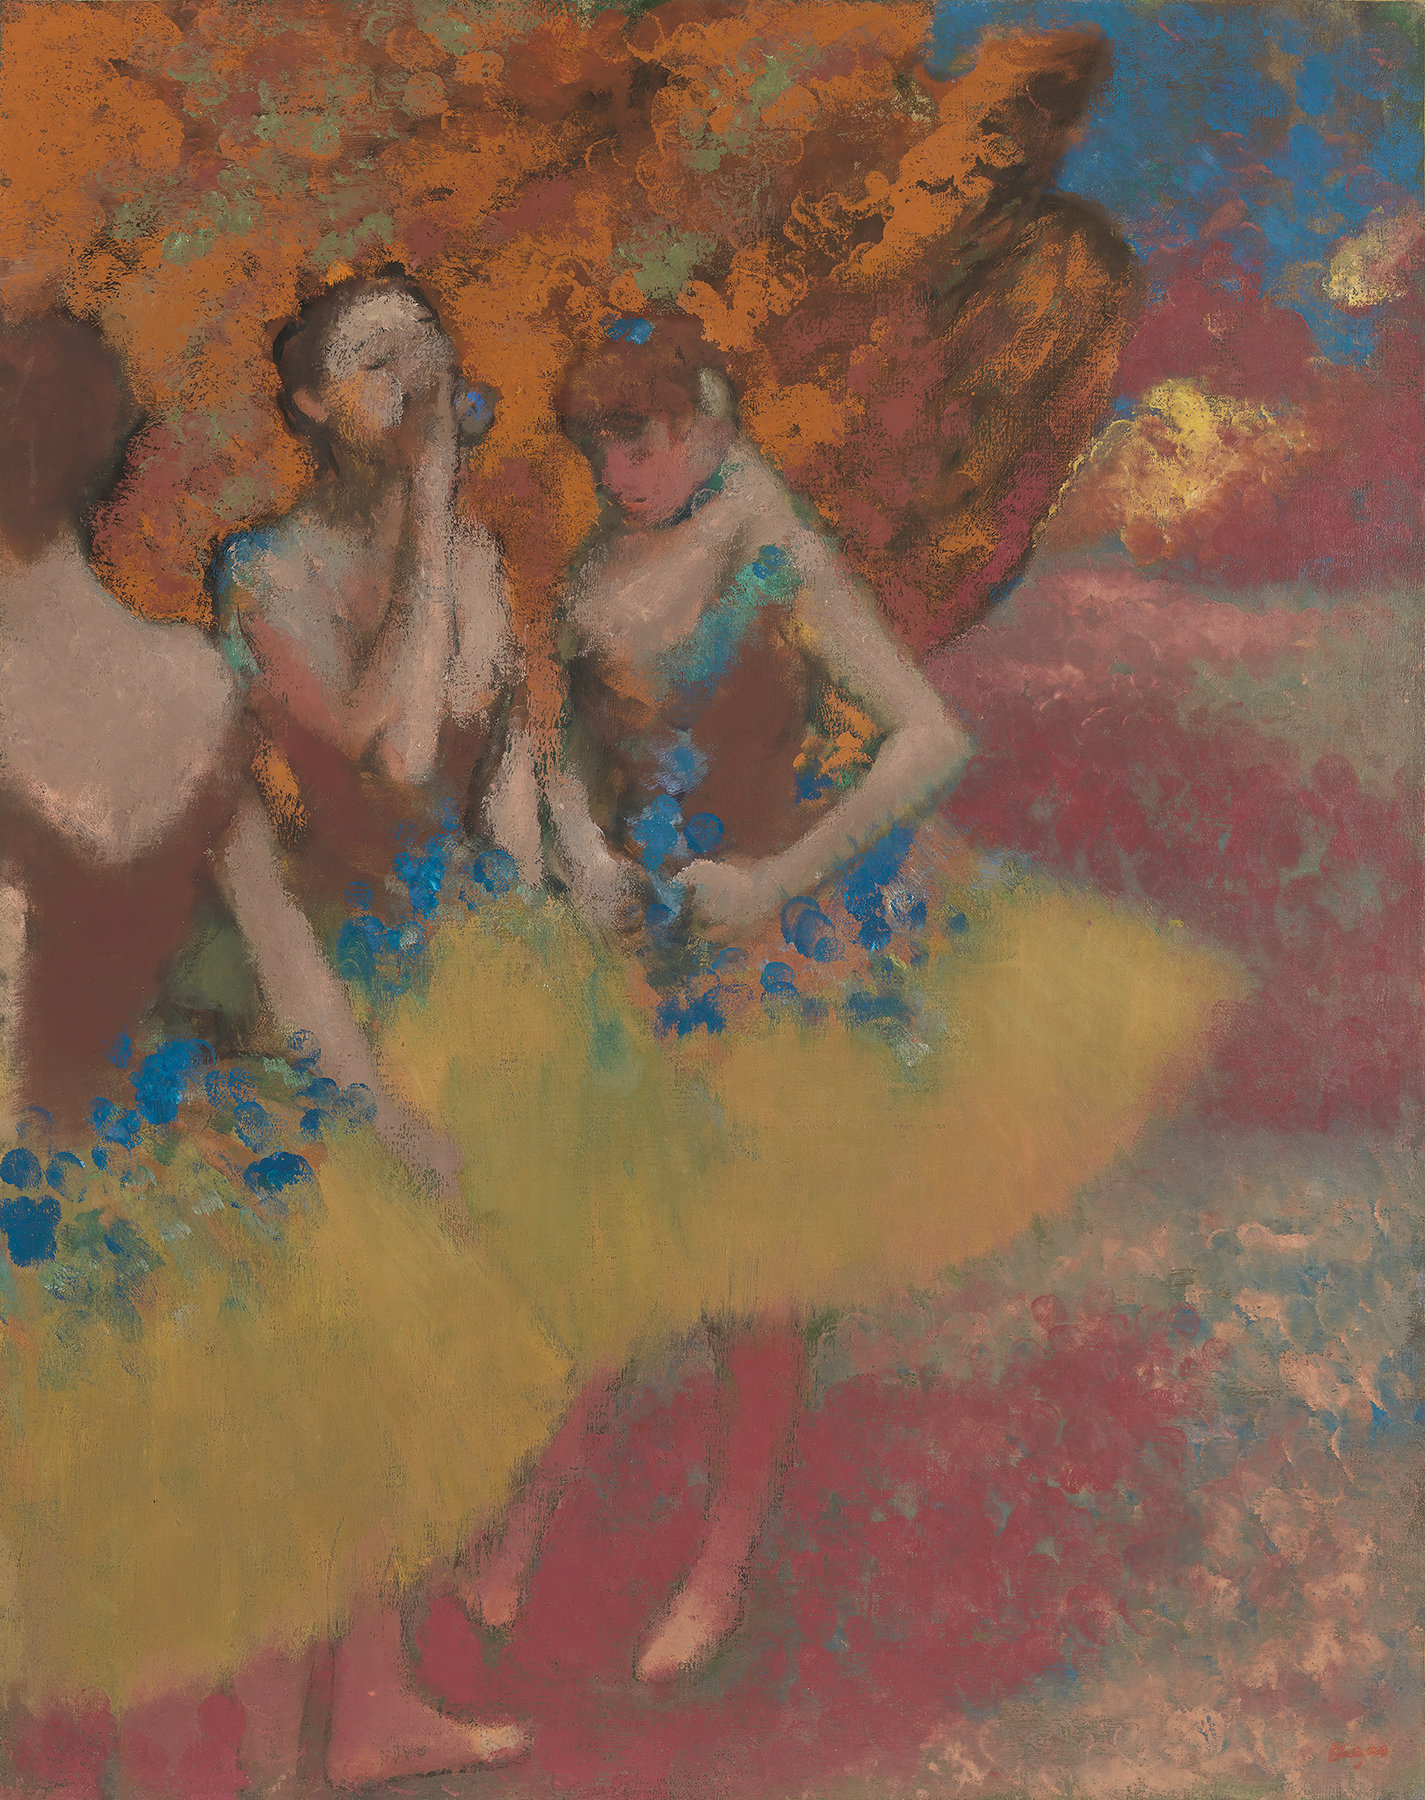 Dalla terra di van Gogh a un Degas da sogno. Assaggi di TEFAF Maastricht 2020 a pochi giorni dall'apertura